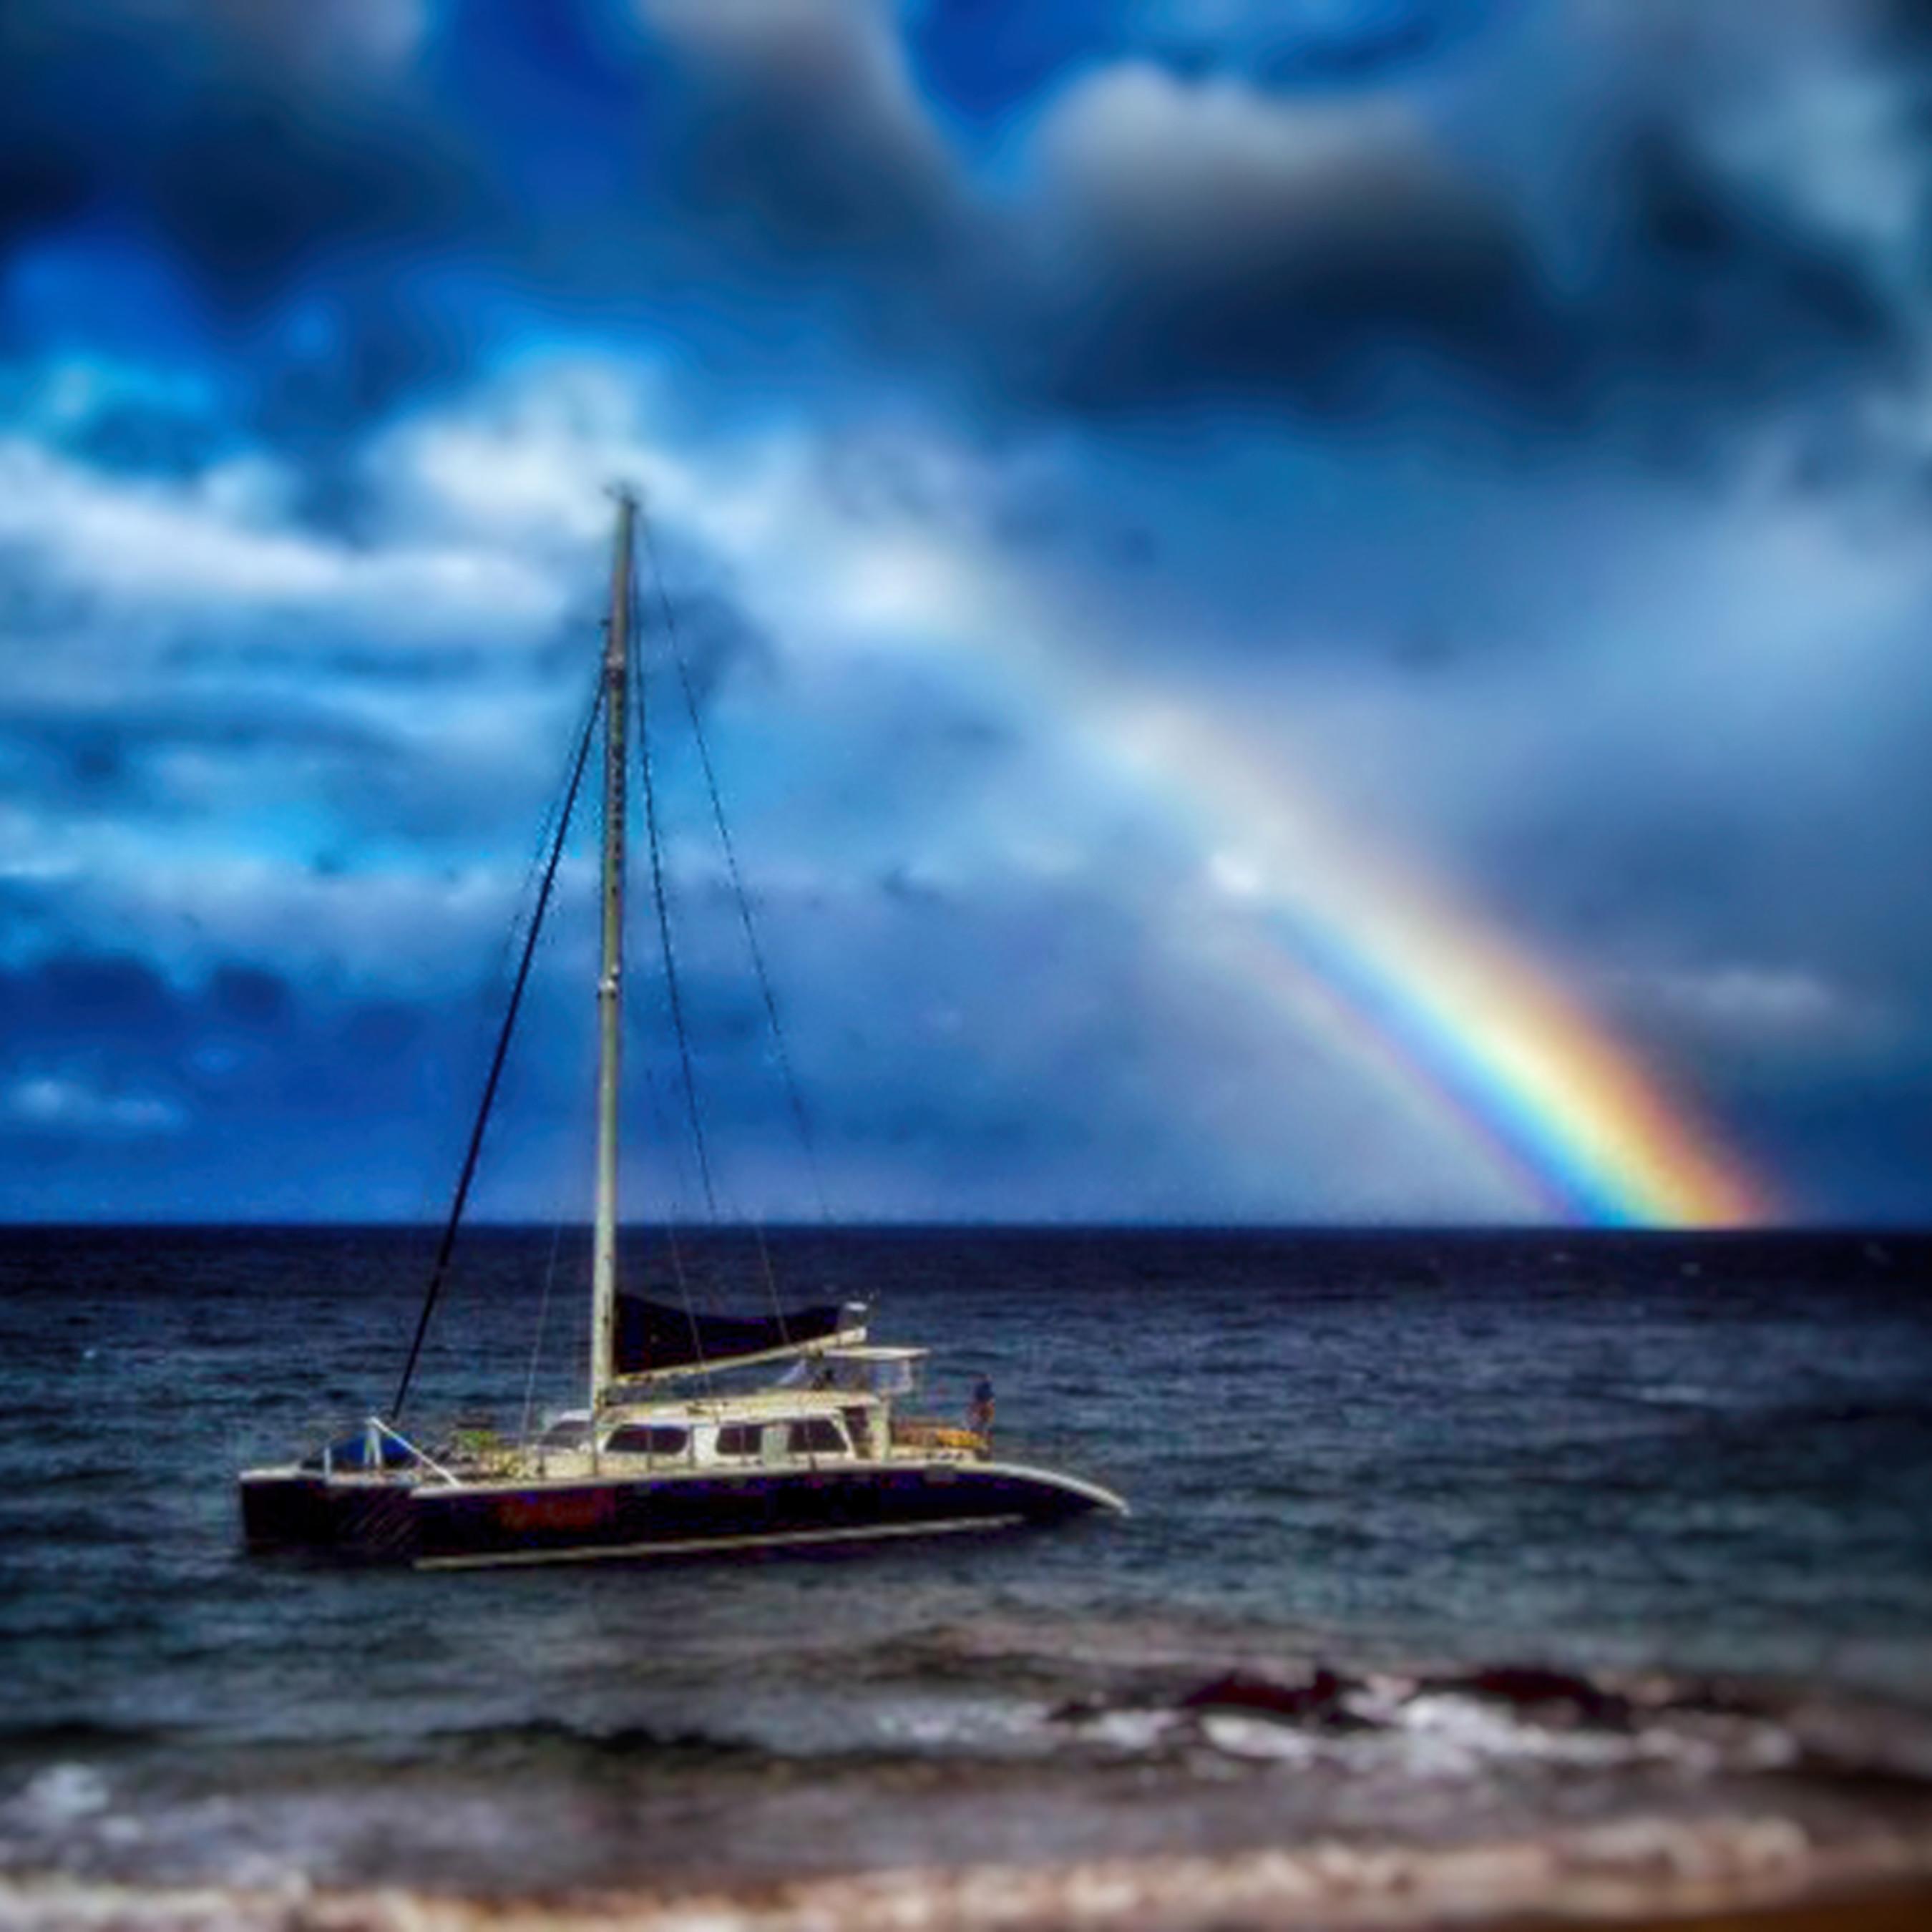 Hawaii rainbox online zm45nz